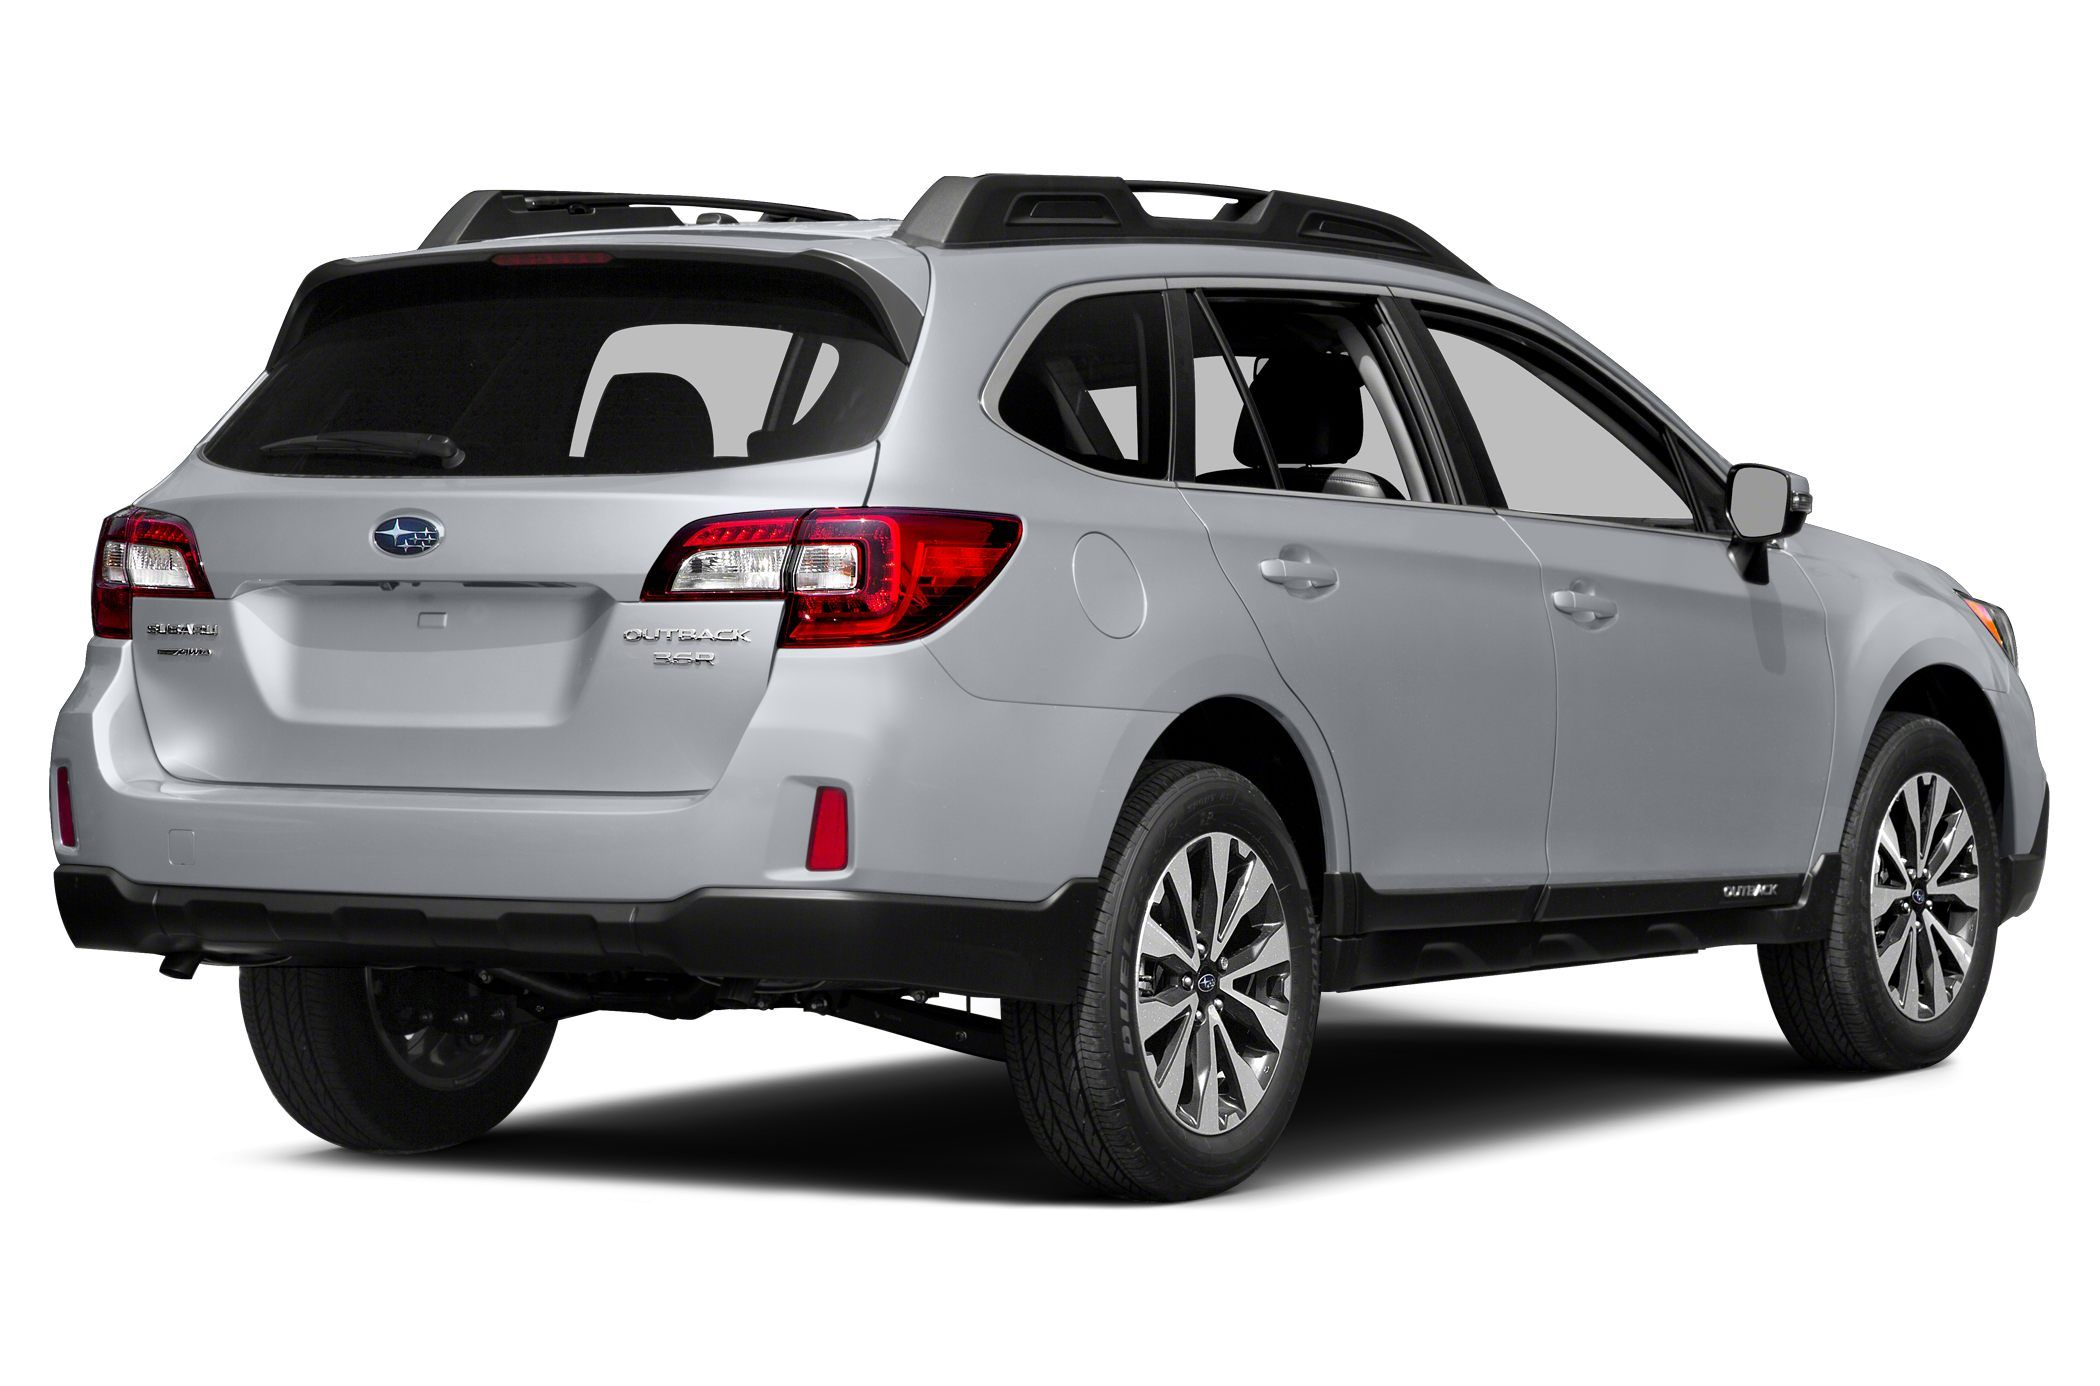 2015 Subaru Outback Wagon 2 5i 4dr All Wheel Drive Wagon Photo 16 Png 2100 1386 Subaru Outback Subaru Subaru Cars